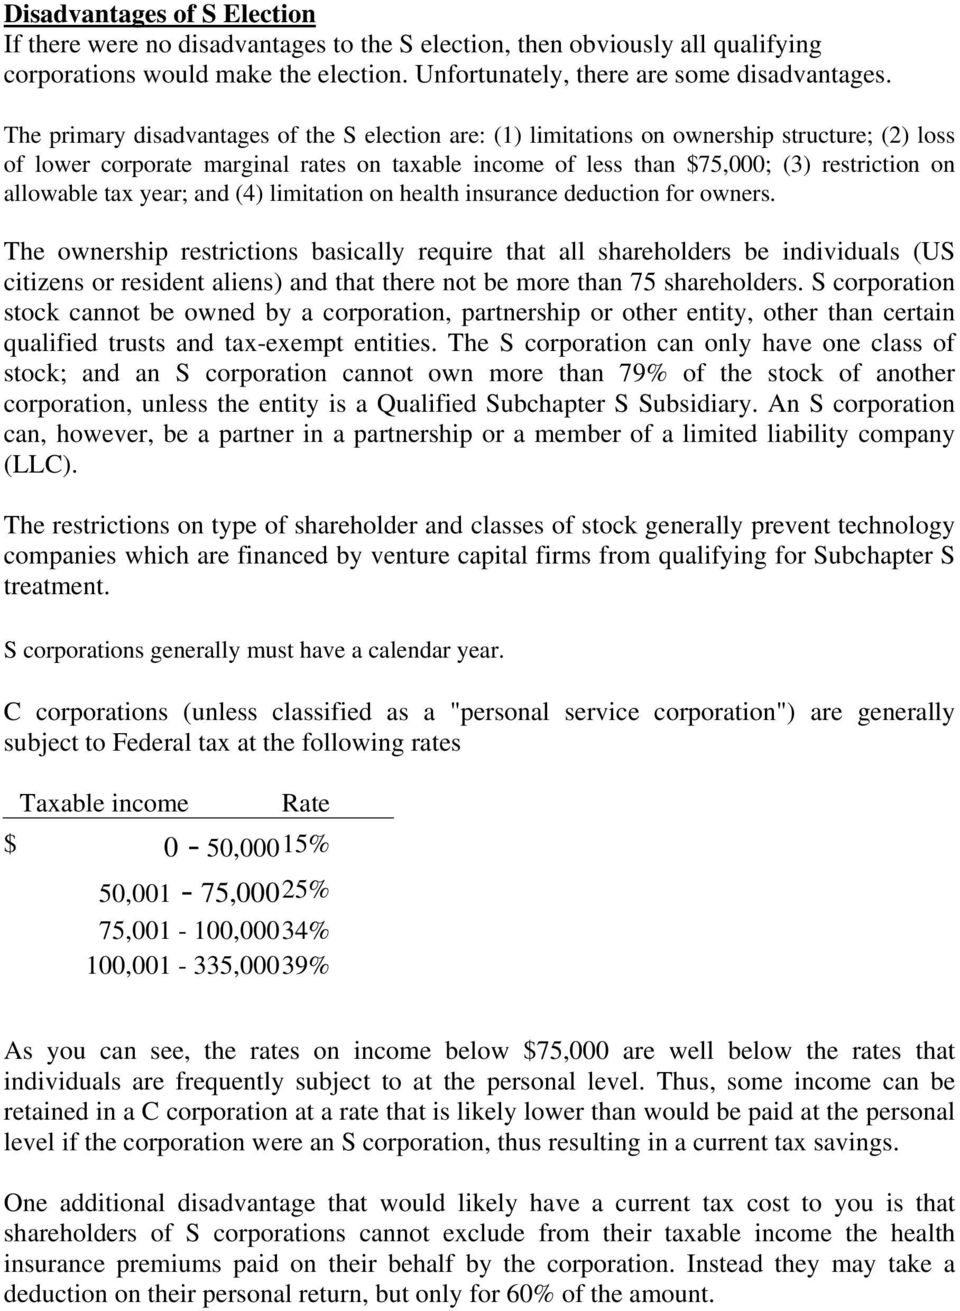 S Corporation Calendar Year | Ten Free Printable Calendar 2019-2020